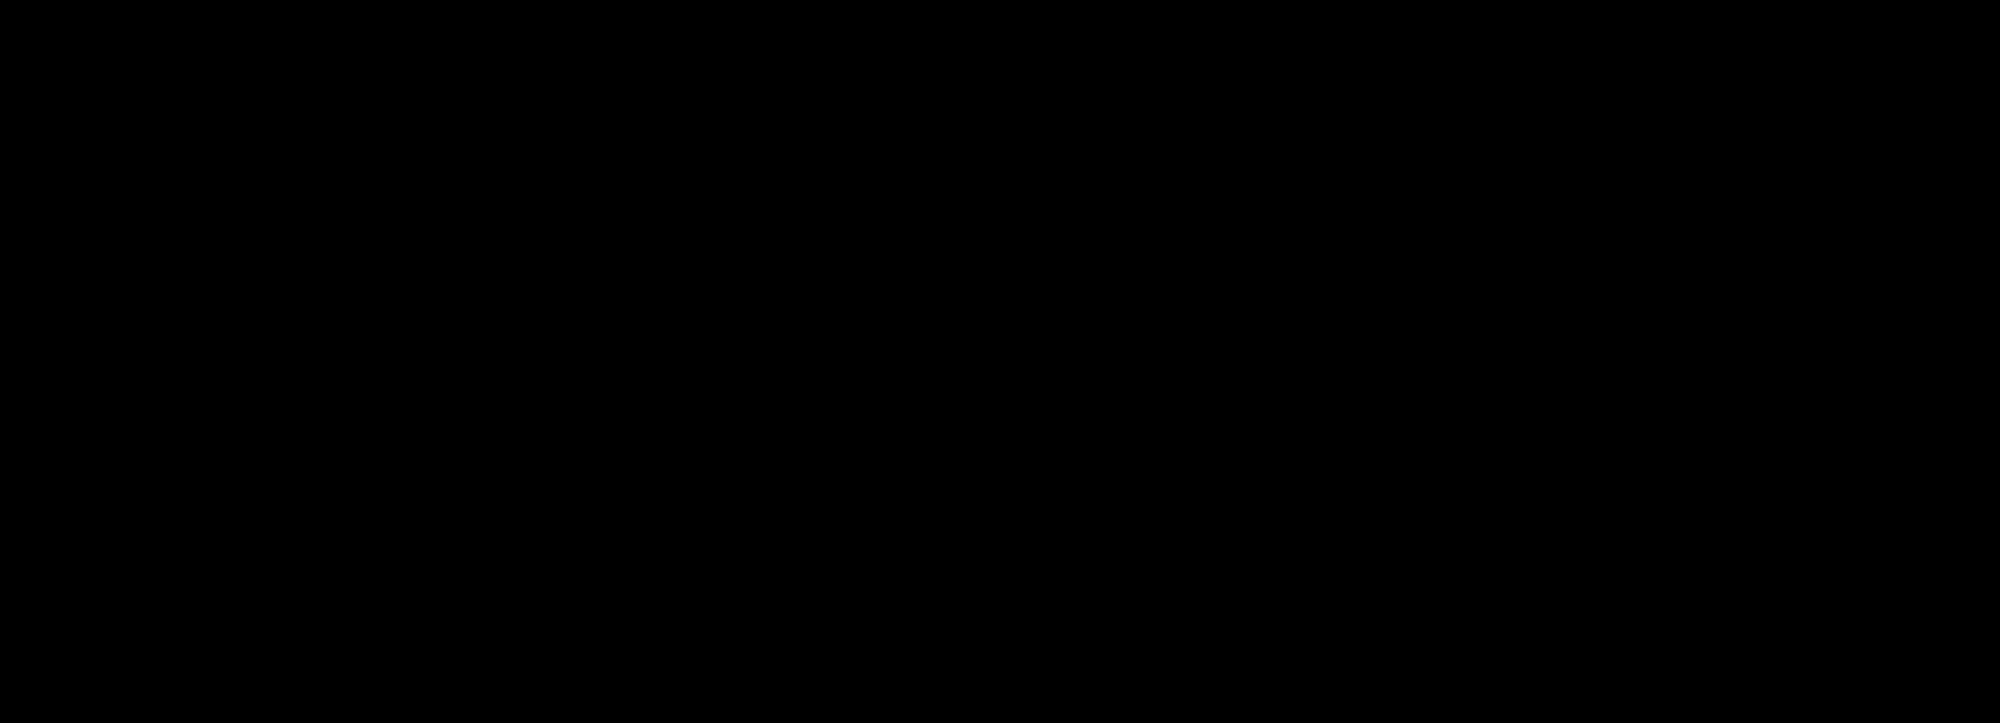 collection of league. Clipart rocket logo